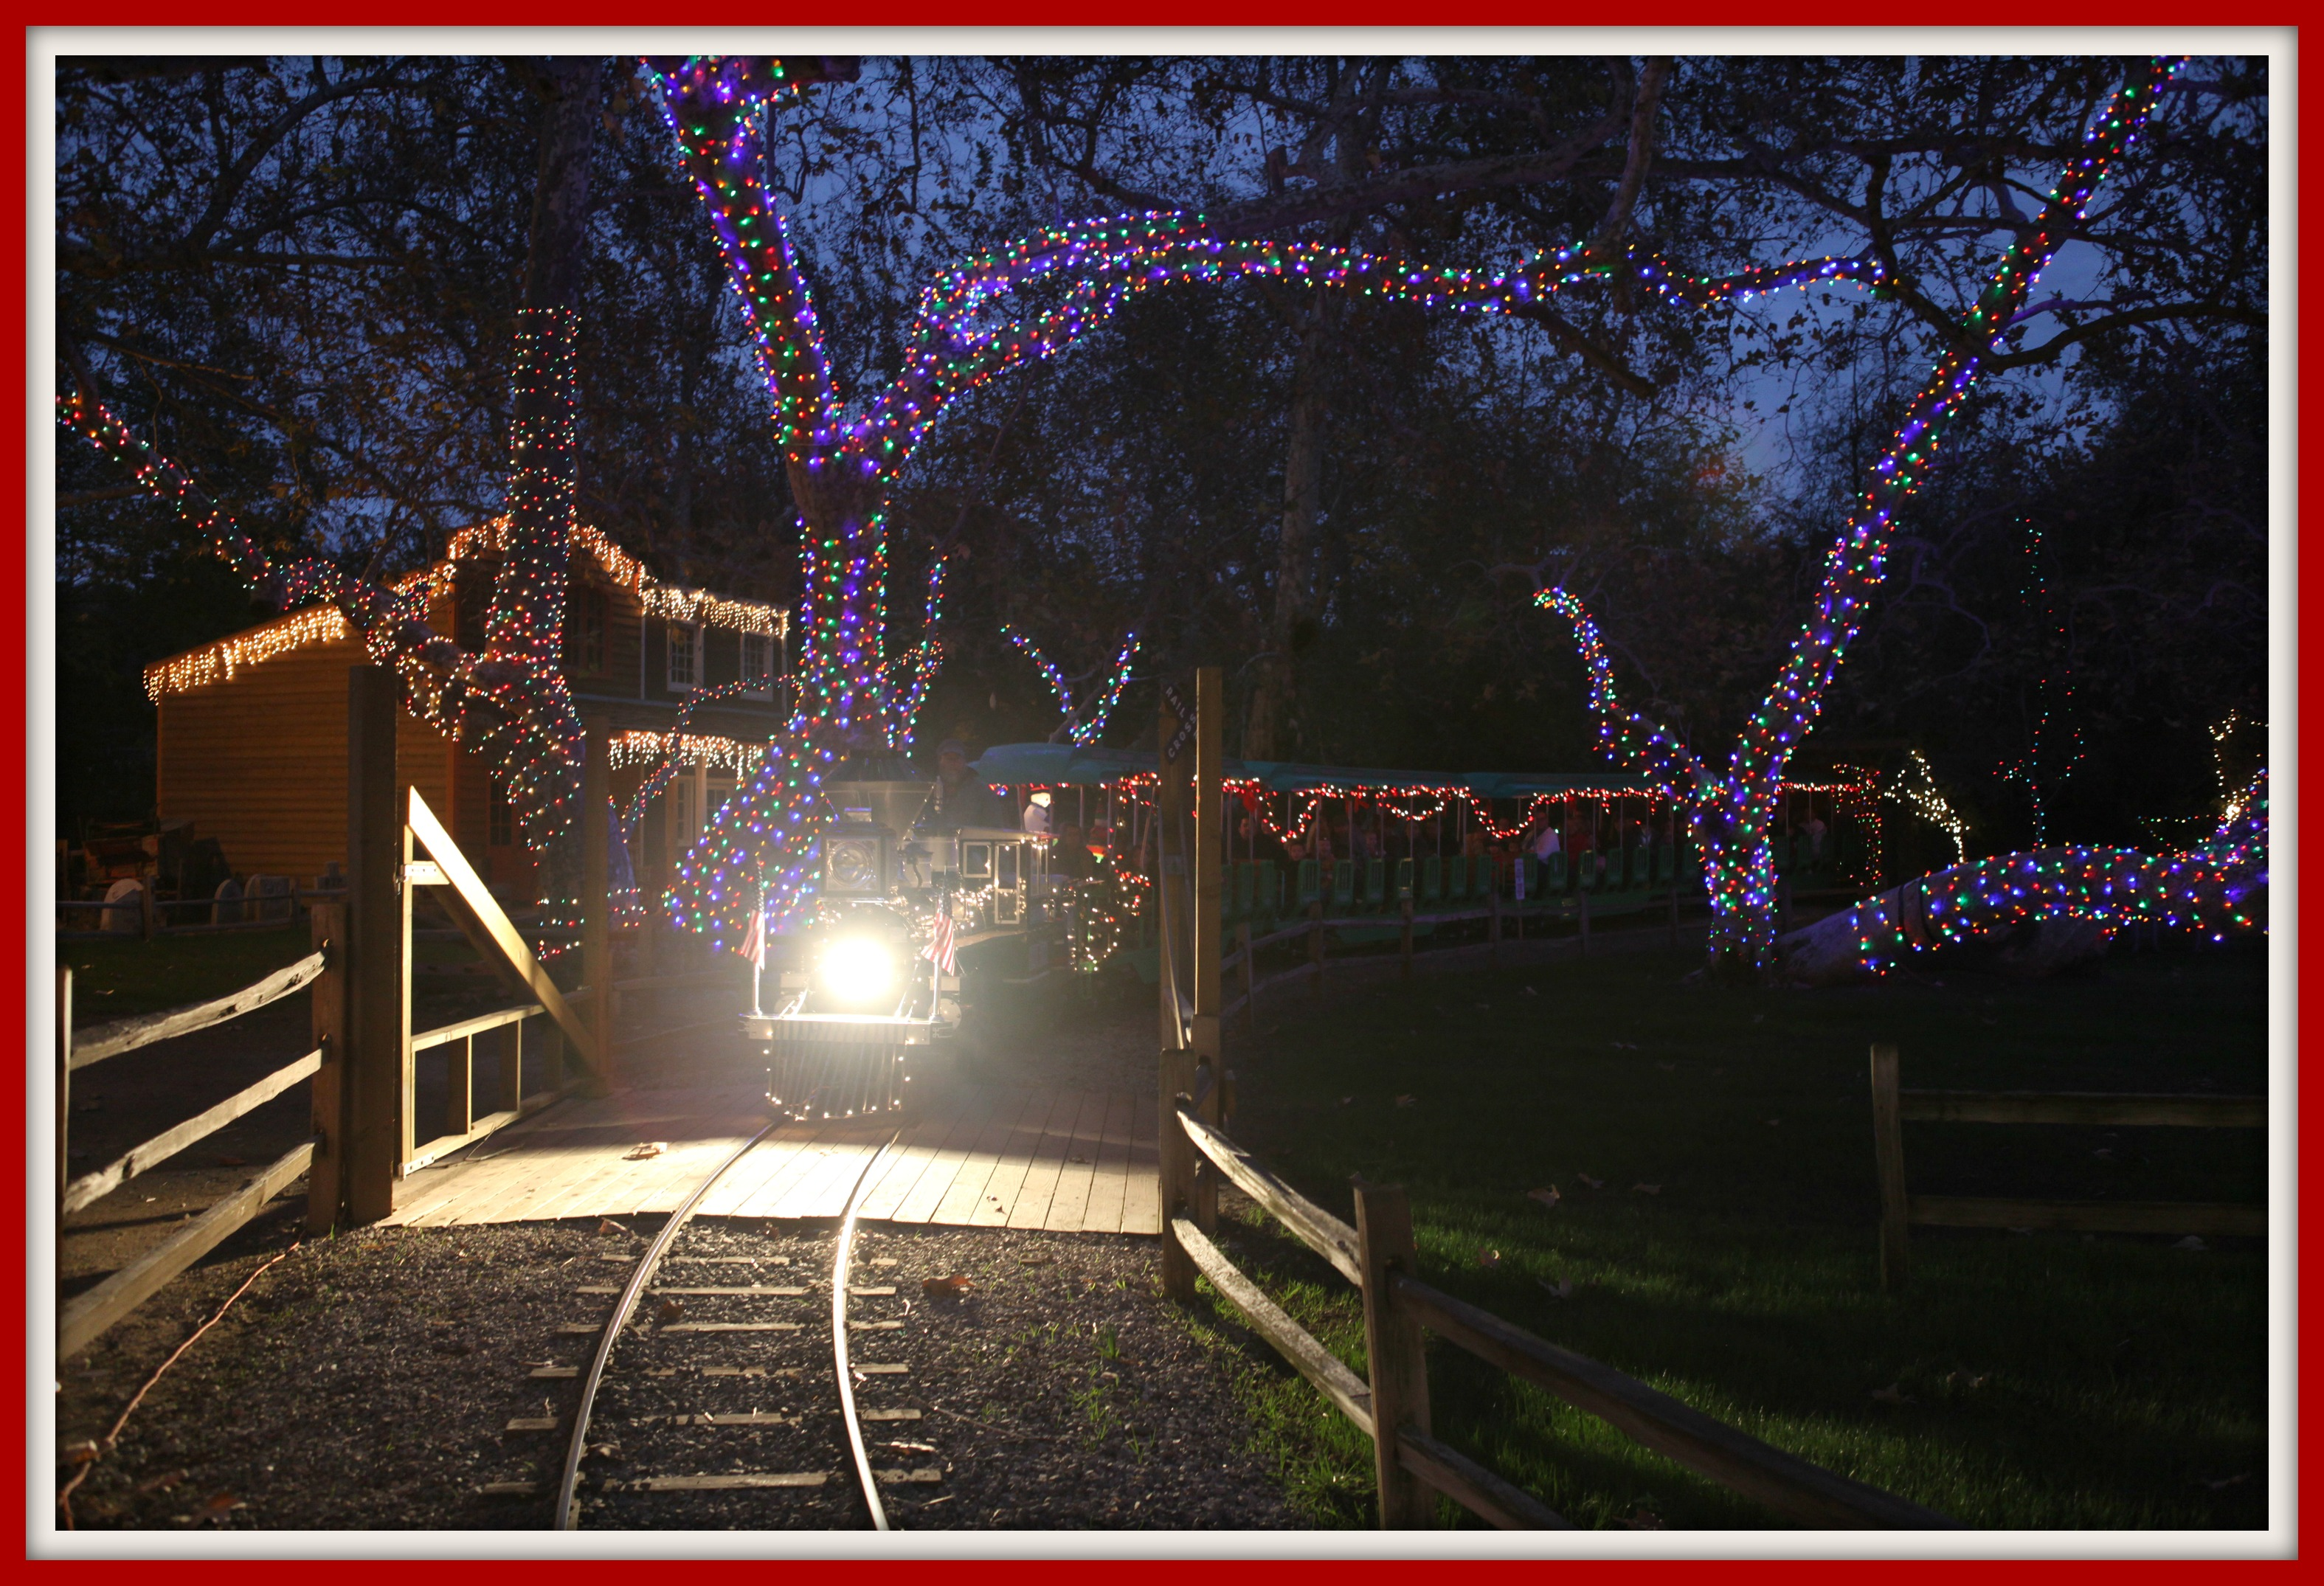 Train With Lights